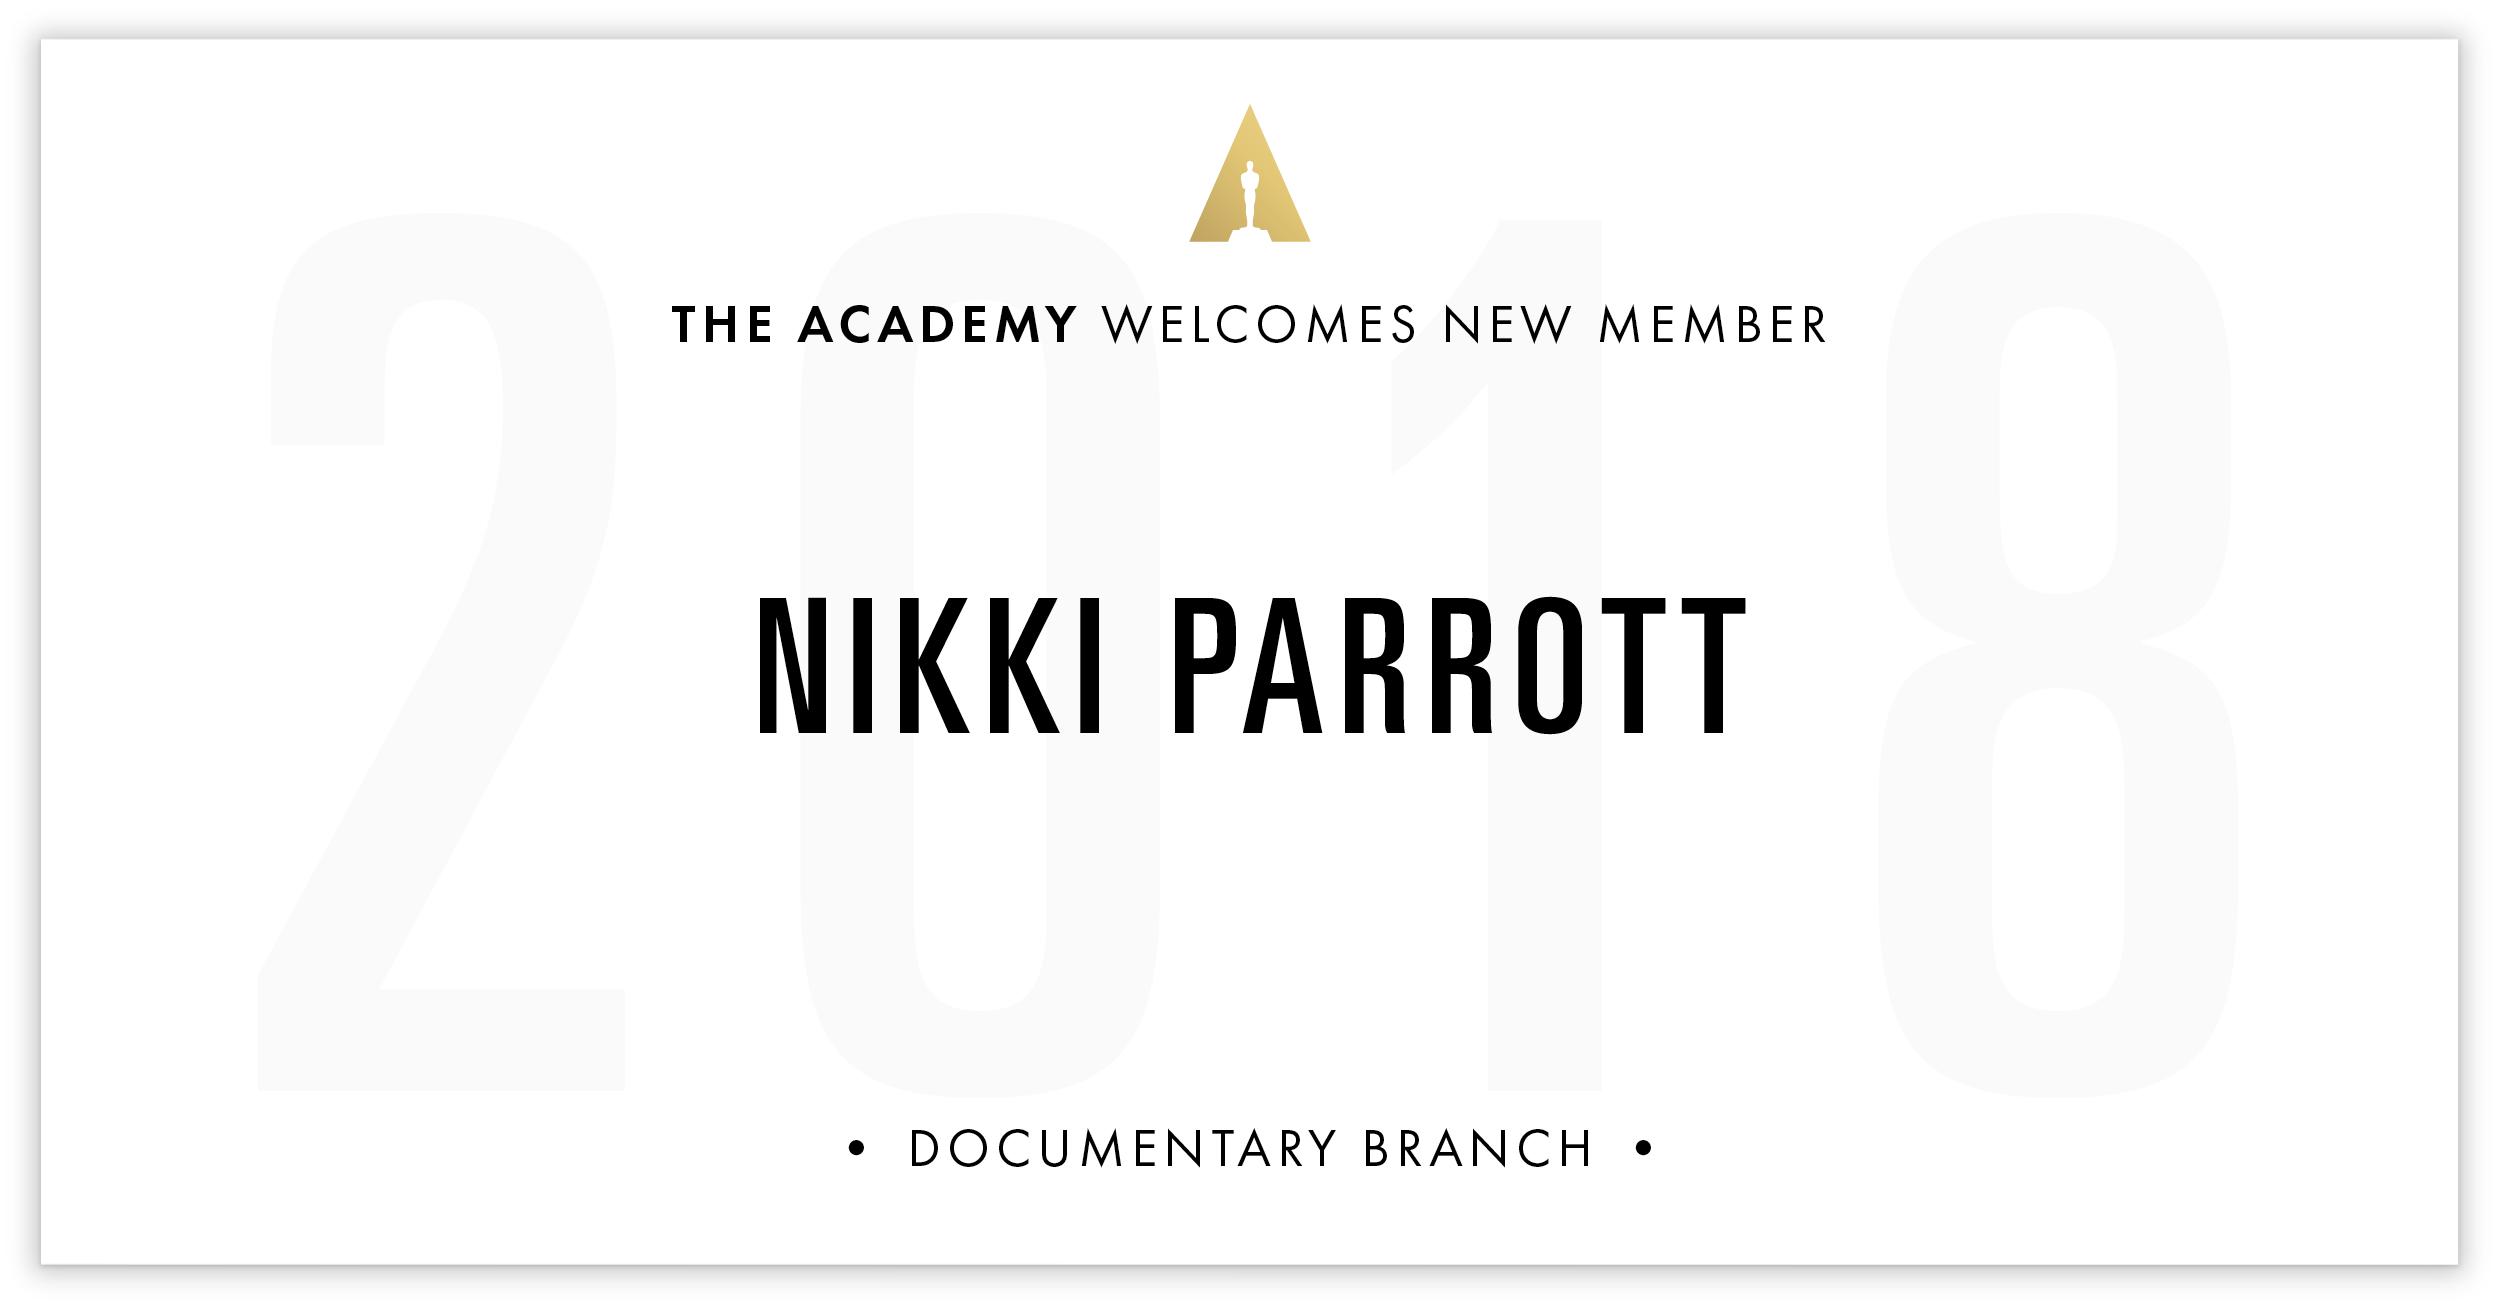 Nikki Parrott is invited!